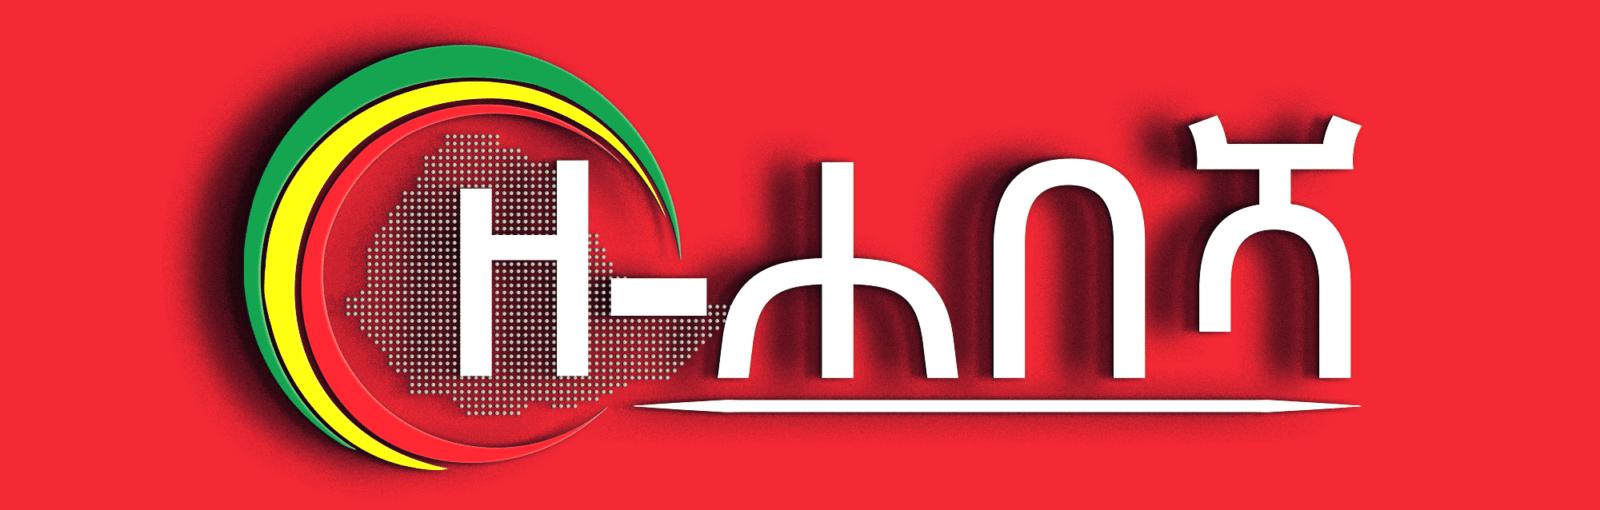 Zehabesha Amharic